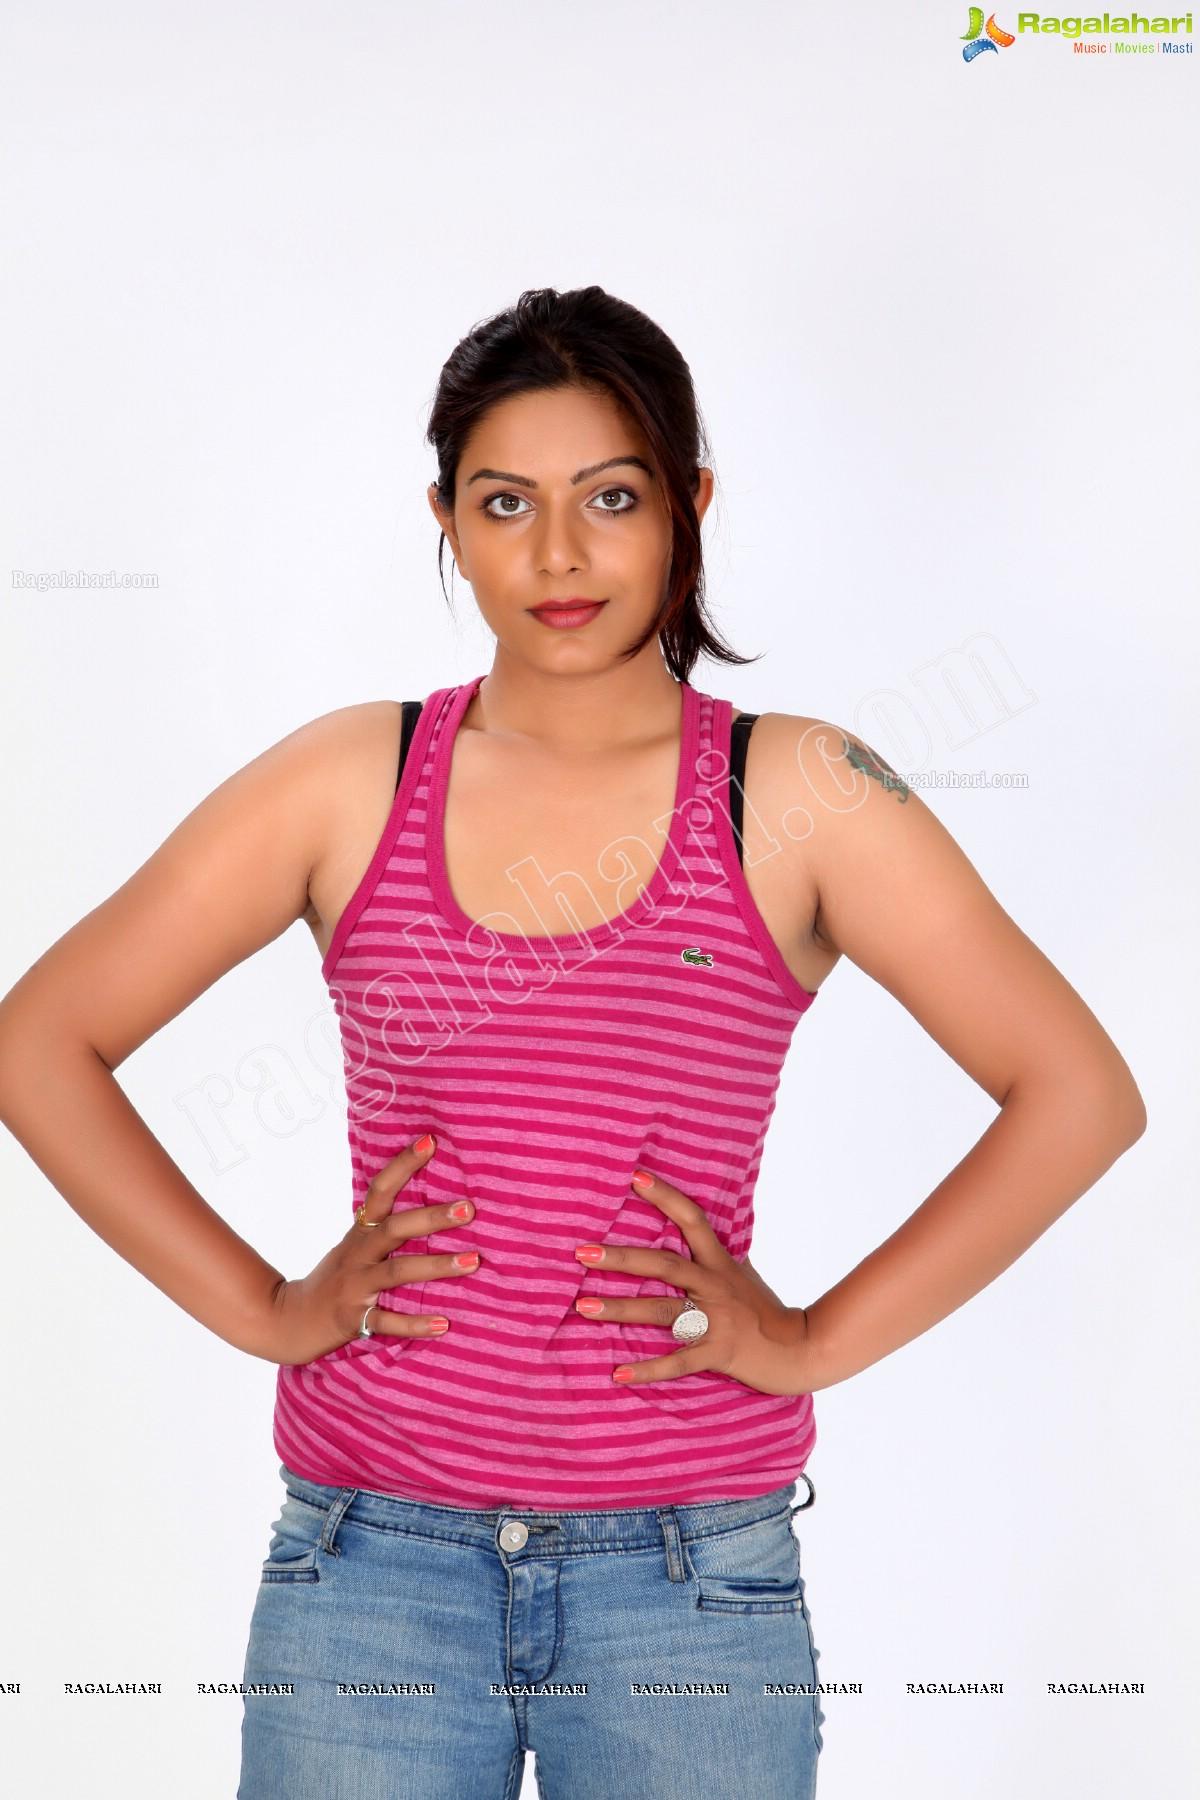 Anjali Dwivedi Image 76 Telugu Actress Photos Stillstelugu Movie